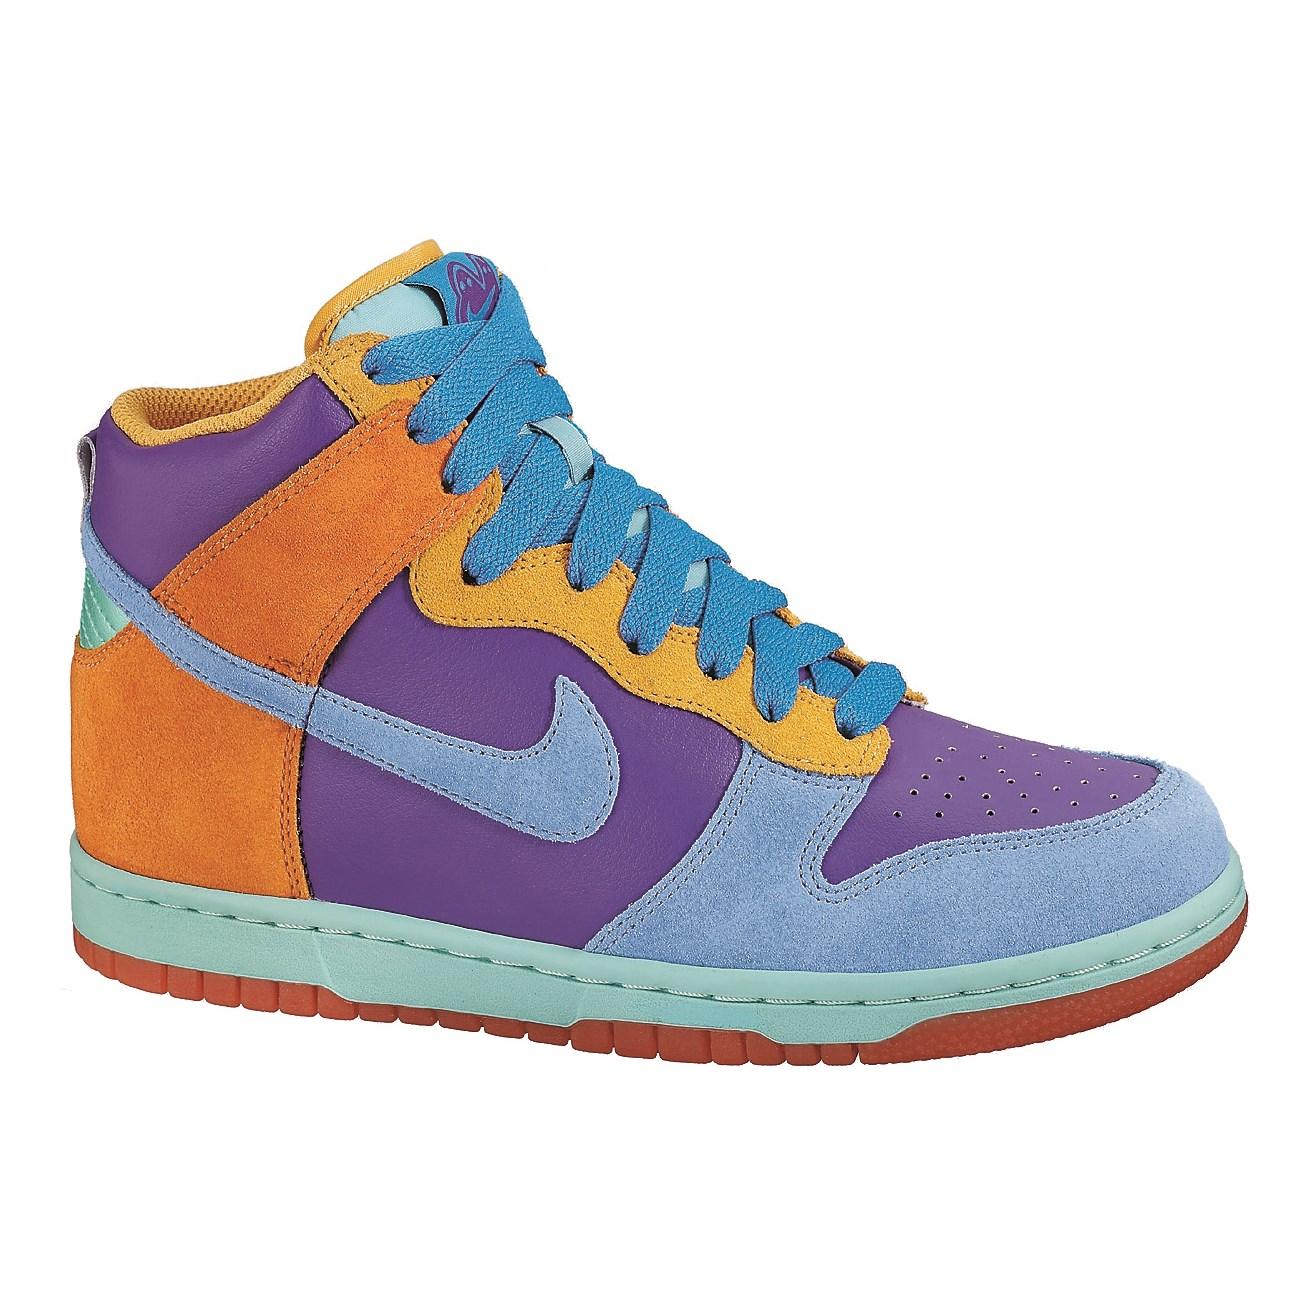 purchase cheap d6cc8 2872d Nike 6.0 Women s Dunk High Shoes   evo